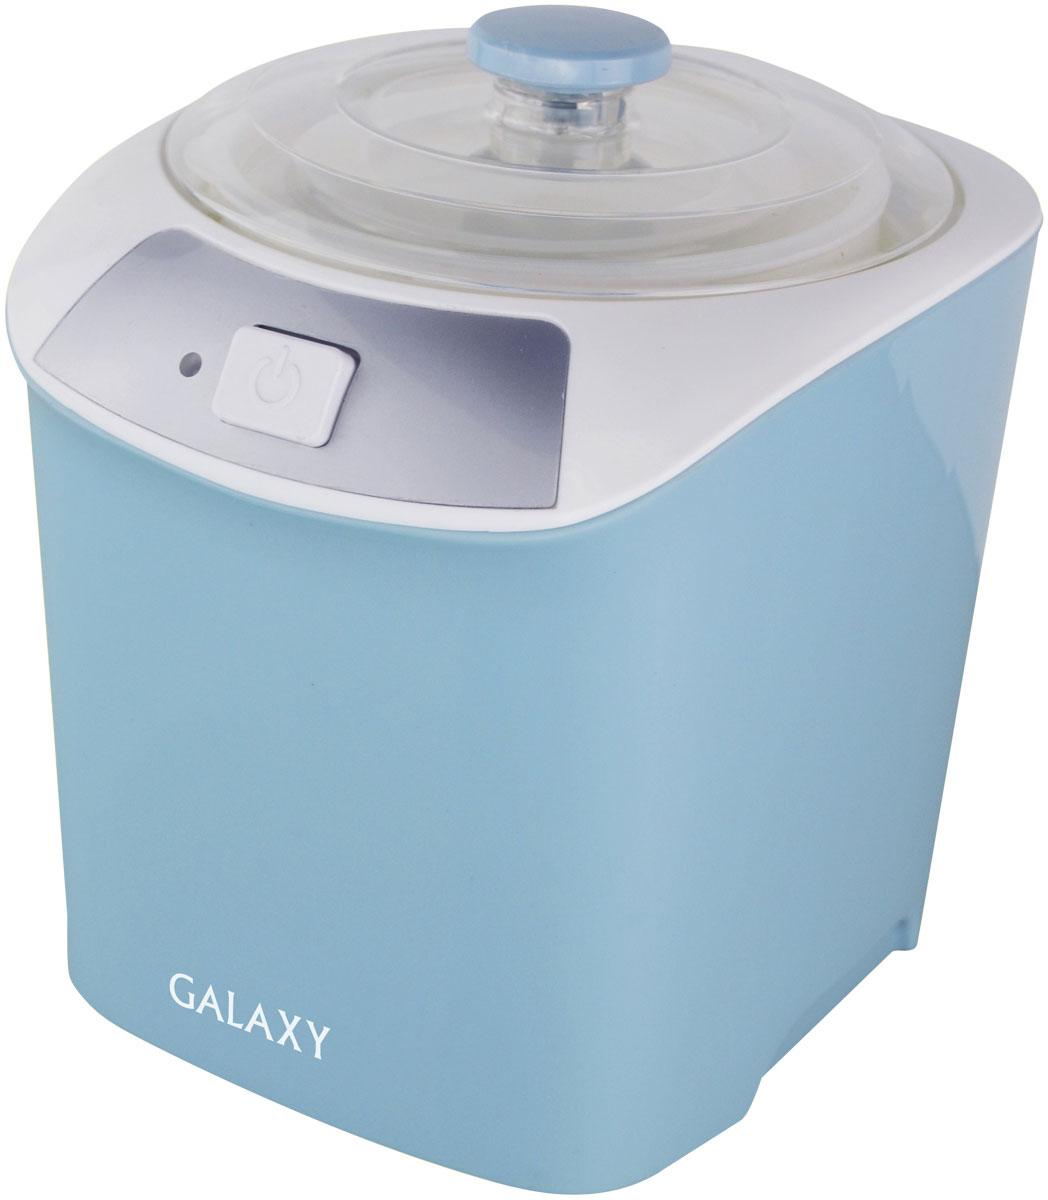 Galaxy GL 2694 йогуртница - Йогуртницы